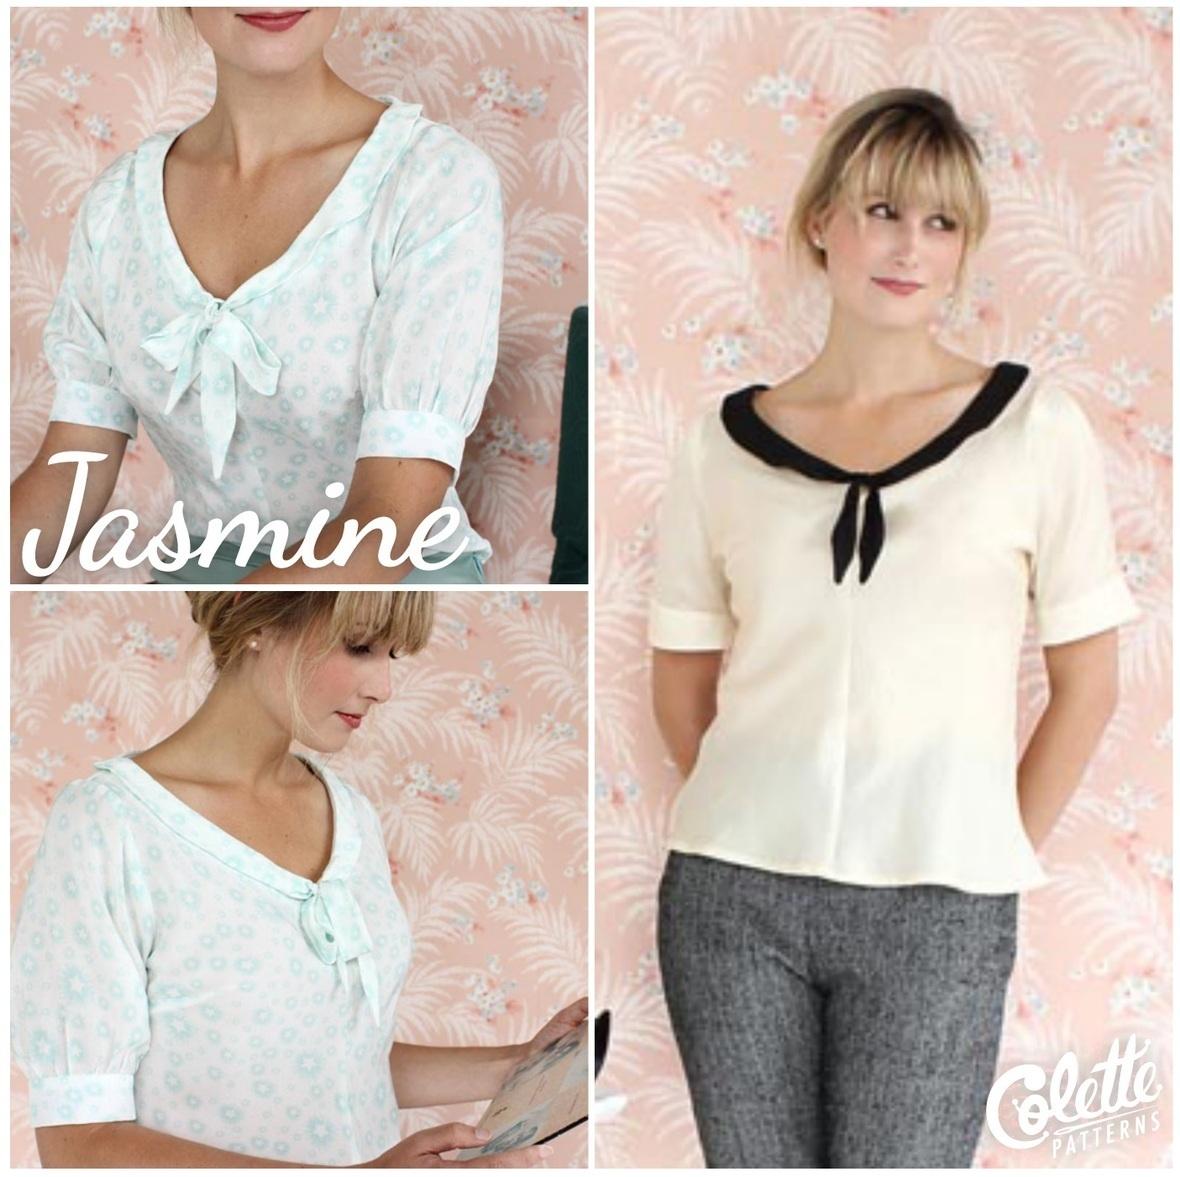 colette patterns jasmine blouse sewing pattern